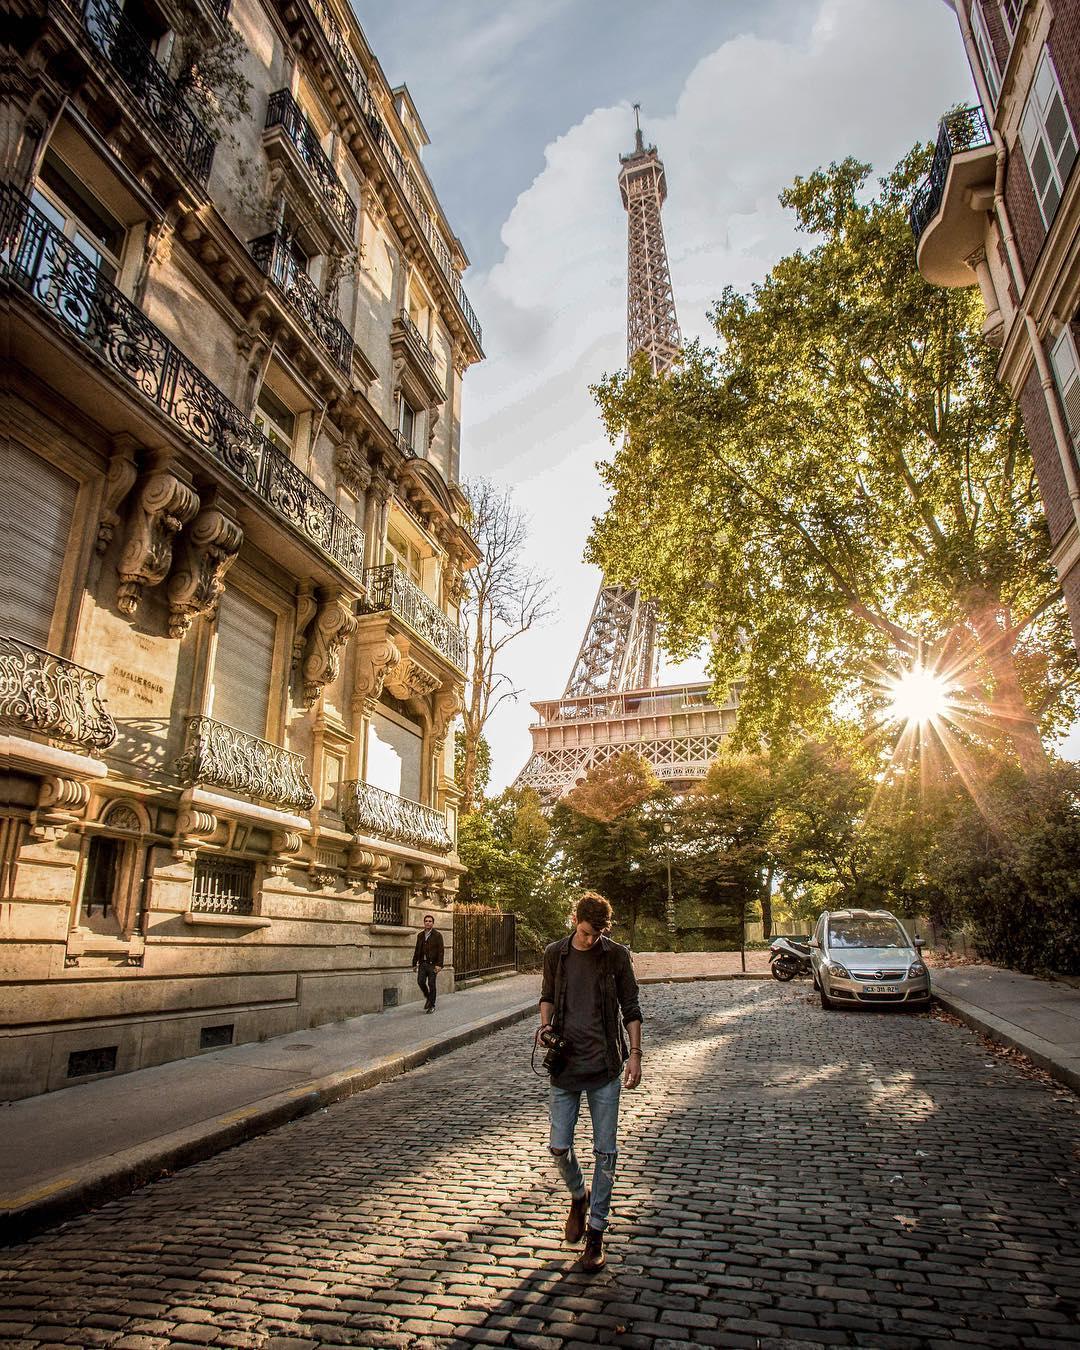 The cobblestoned streets